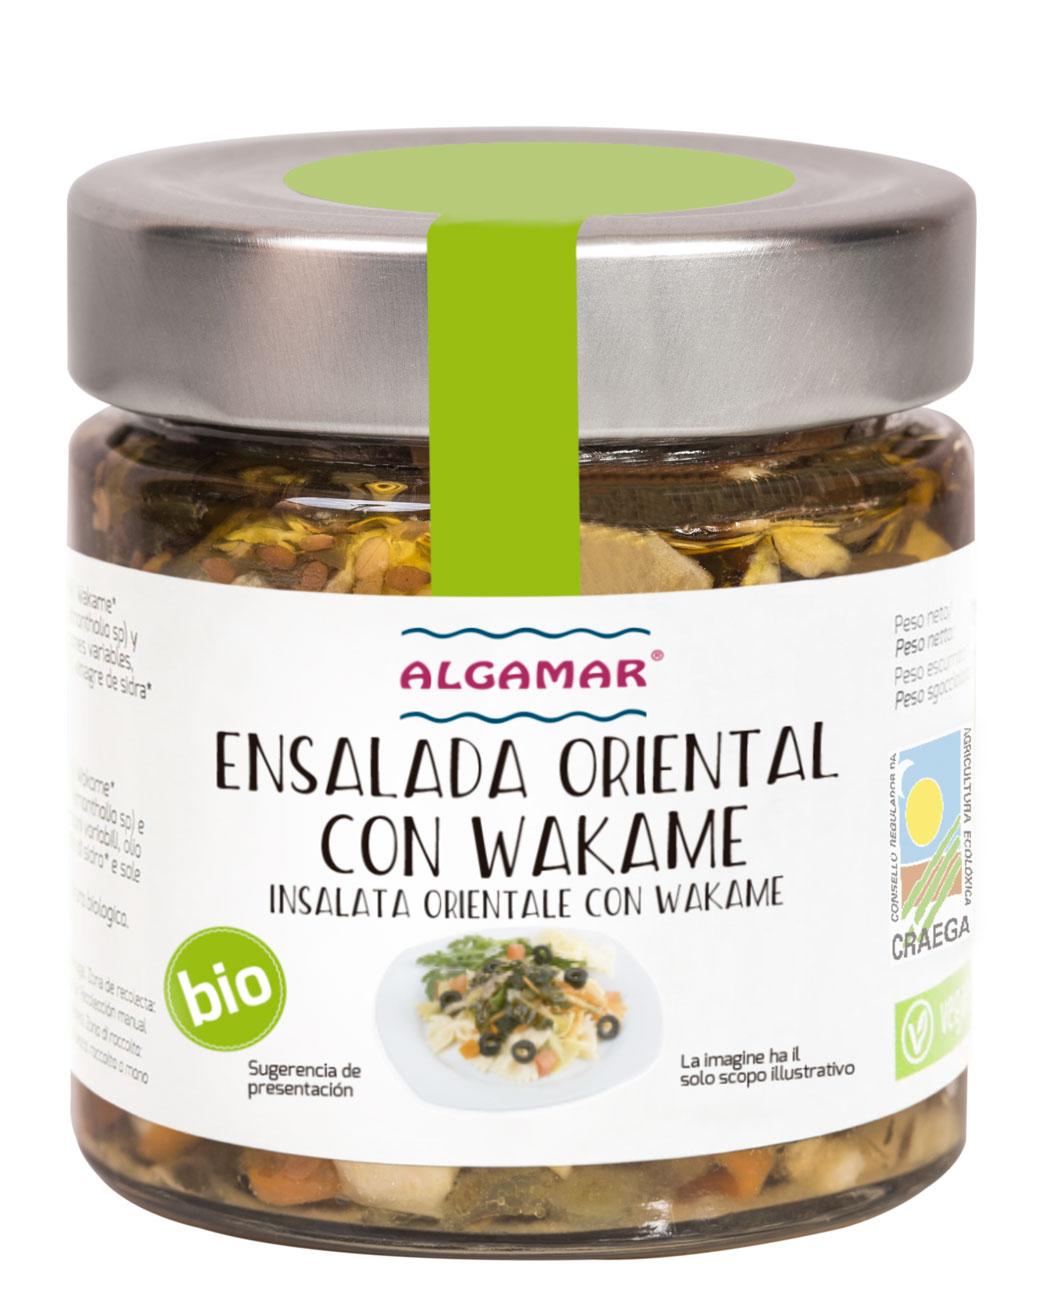 ensalda-oriental-wakame-espanol-algamar